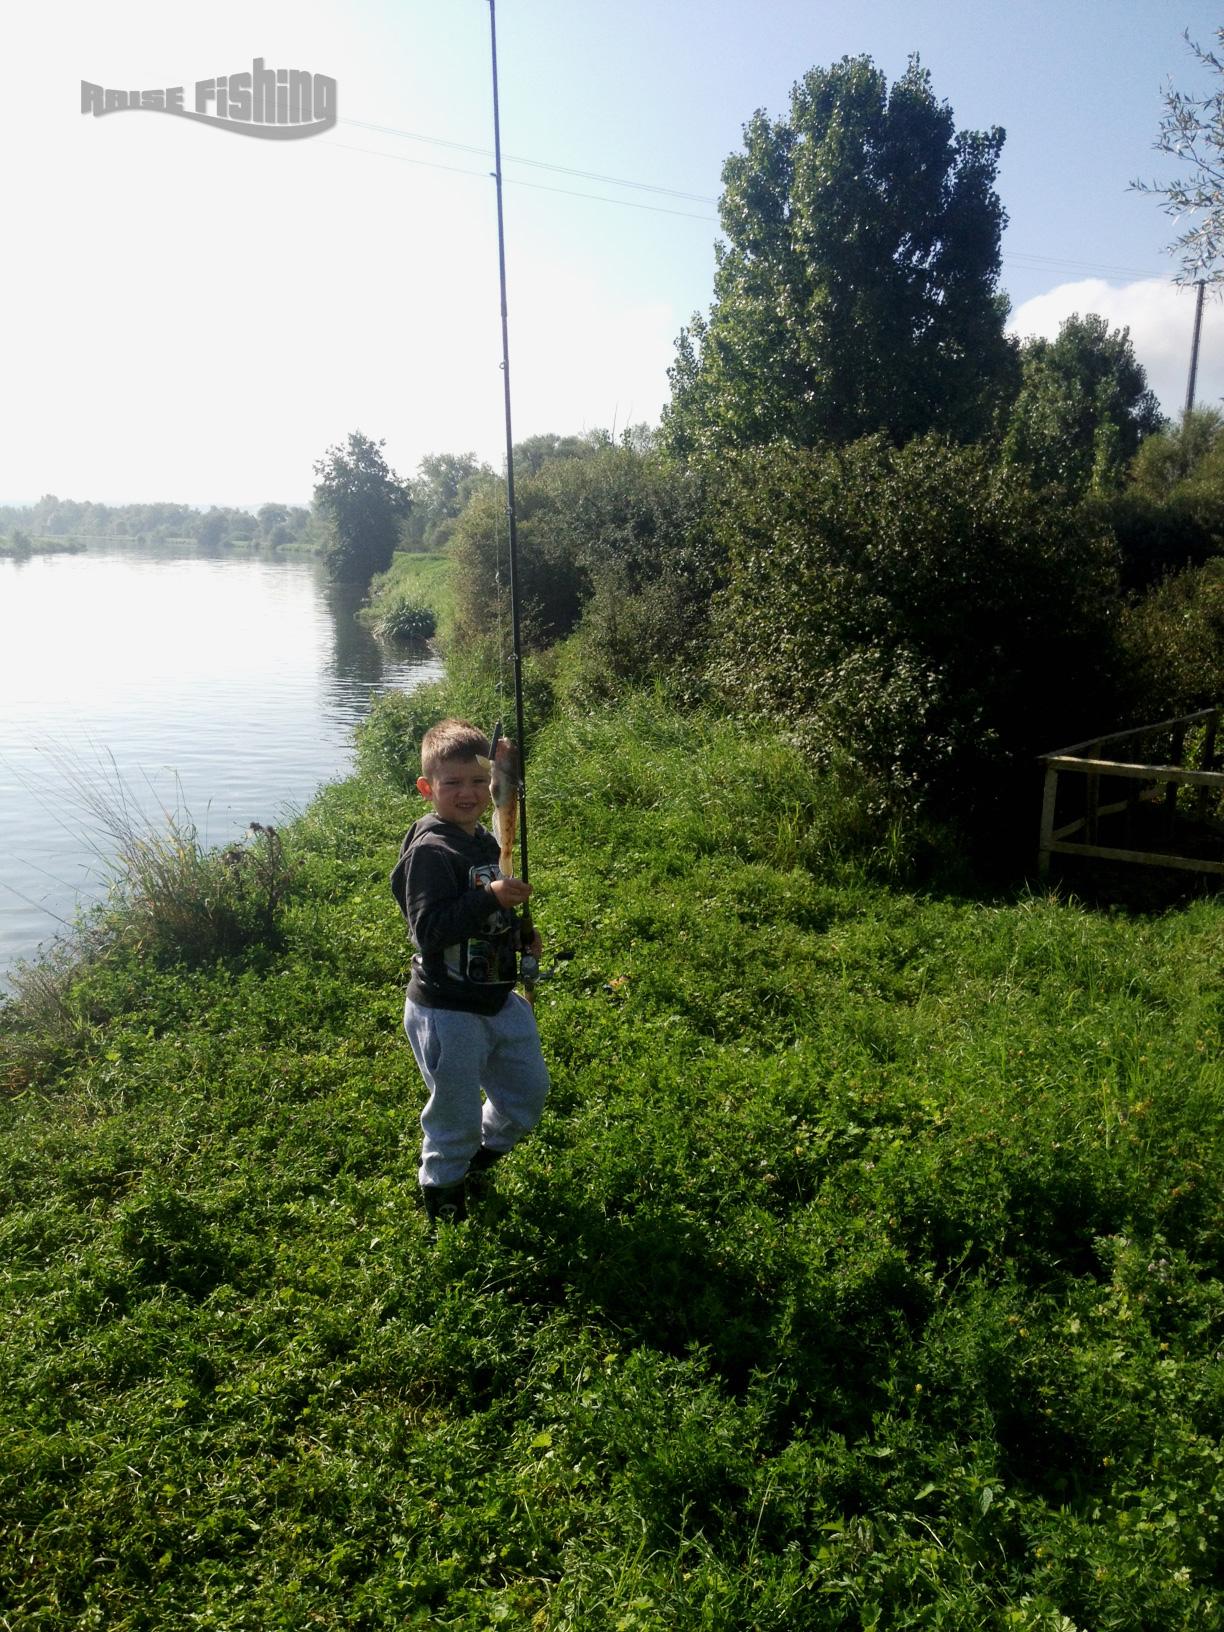 La pêche sur lombre enisej krasnoyarsk